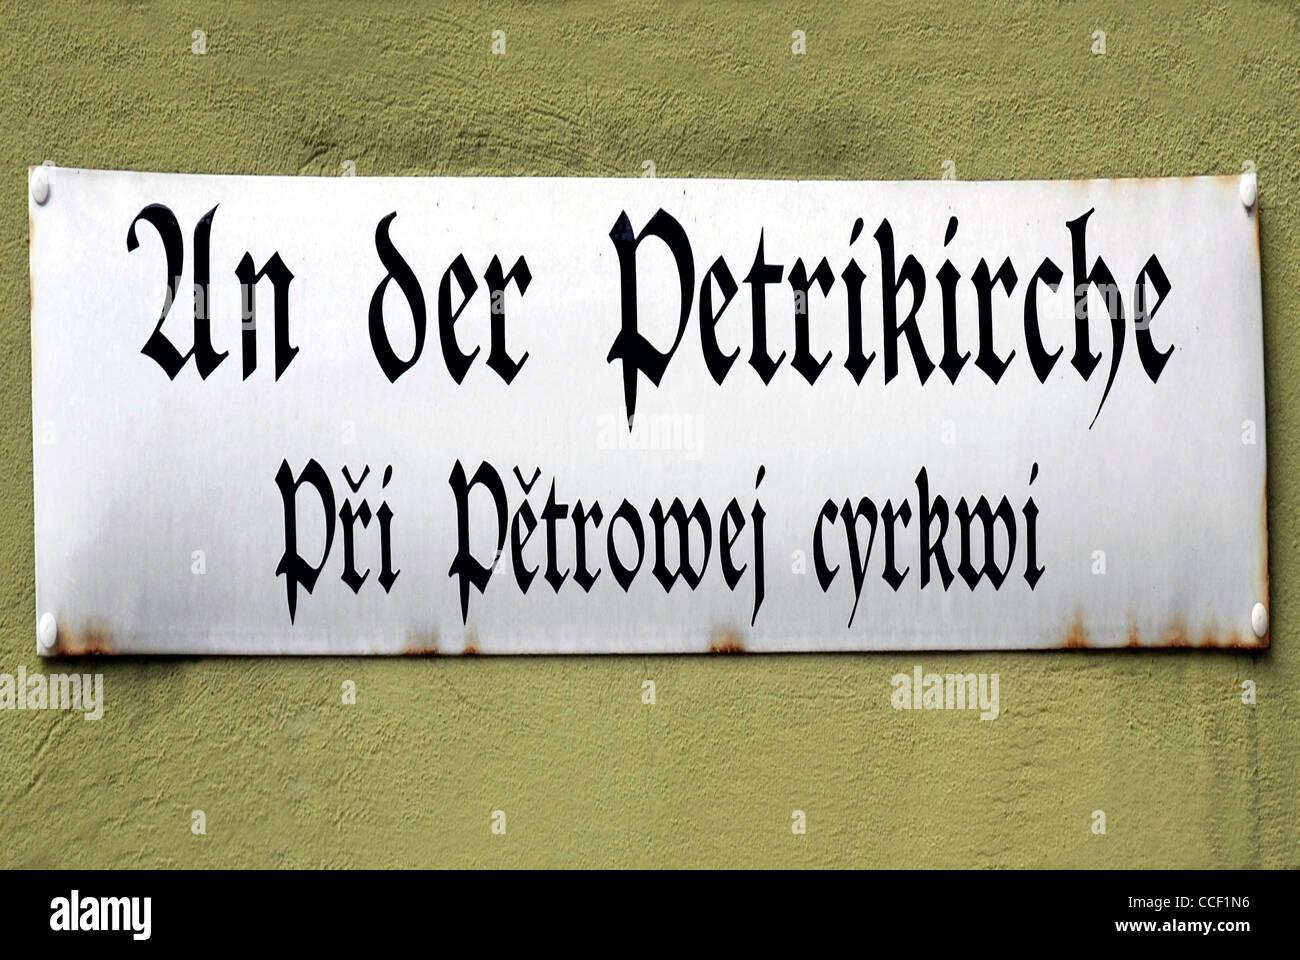 Street sign of Bautzen in German and Sorbian language at the Petrikirche - Pri Petrowej cyrkwi. - Stock Image